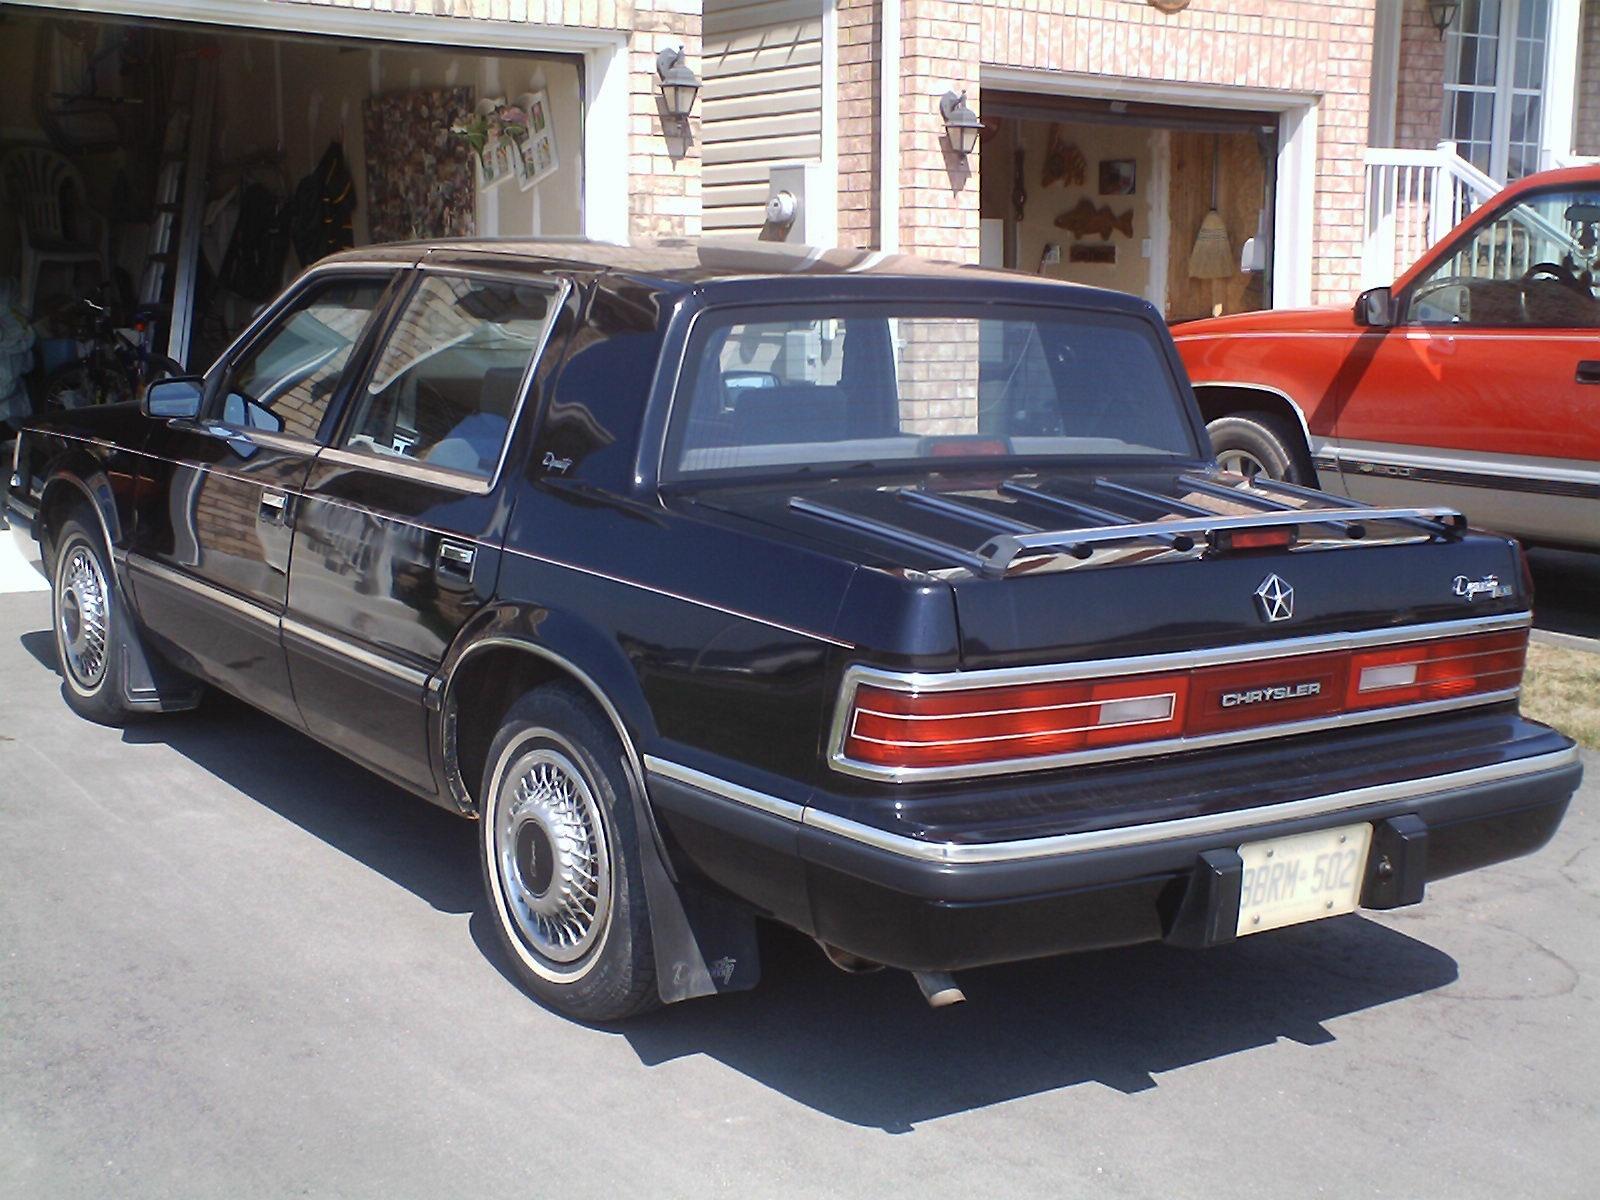 1993 Chrysler Dynasty Overview Cargurus